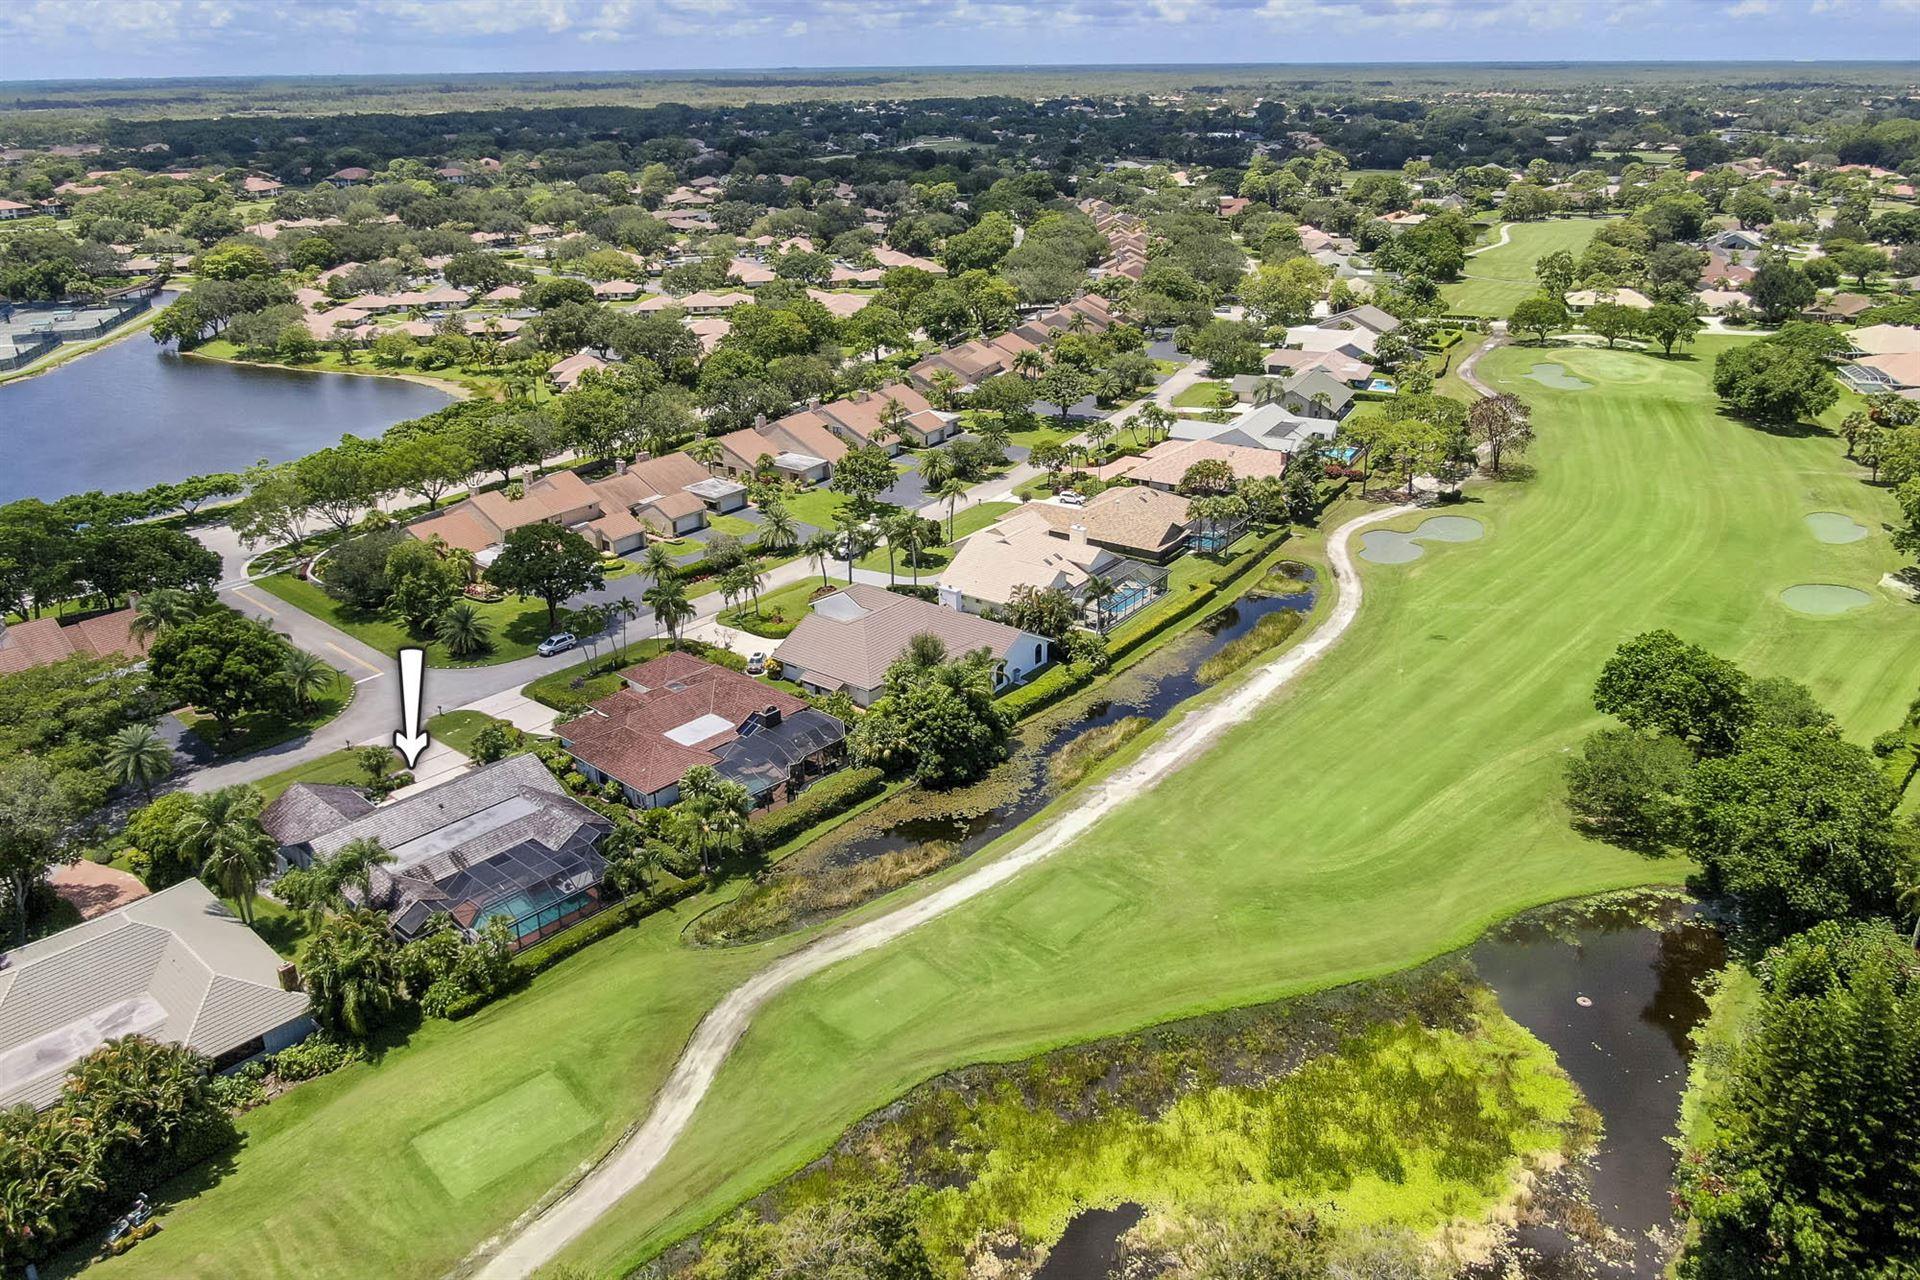 2 Balfour Road E, Palm Beach Gardens, FL 33418 - MLS#: RX-10739879